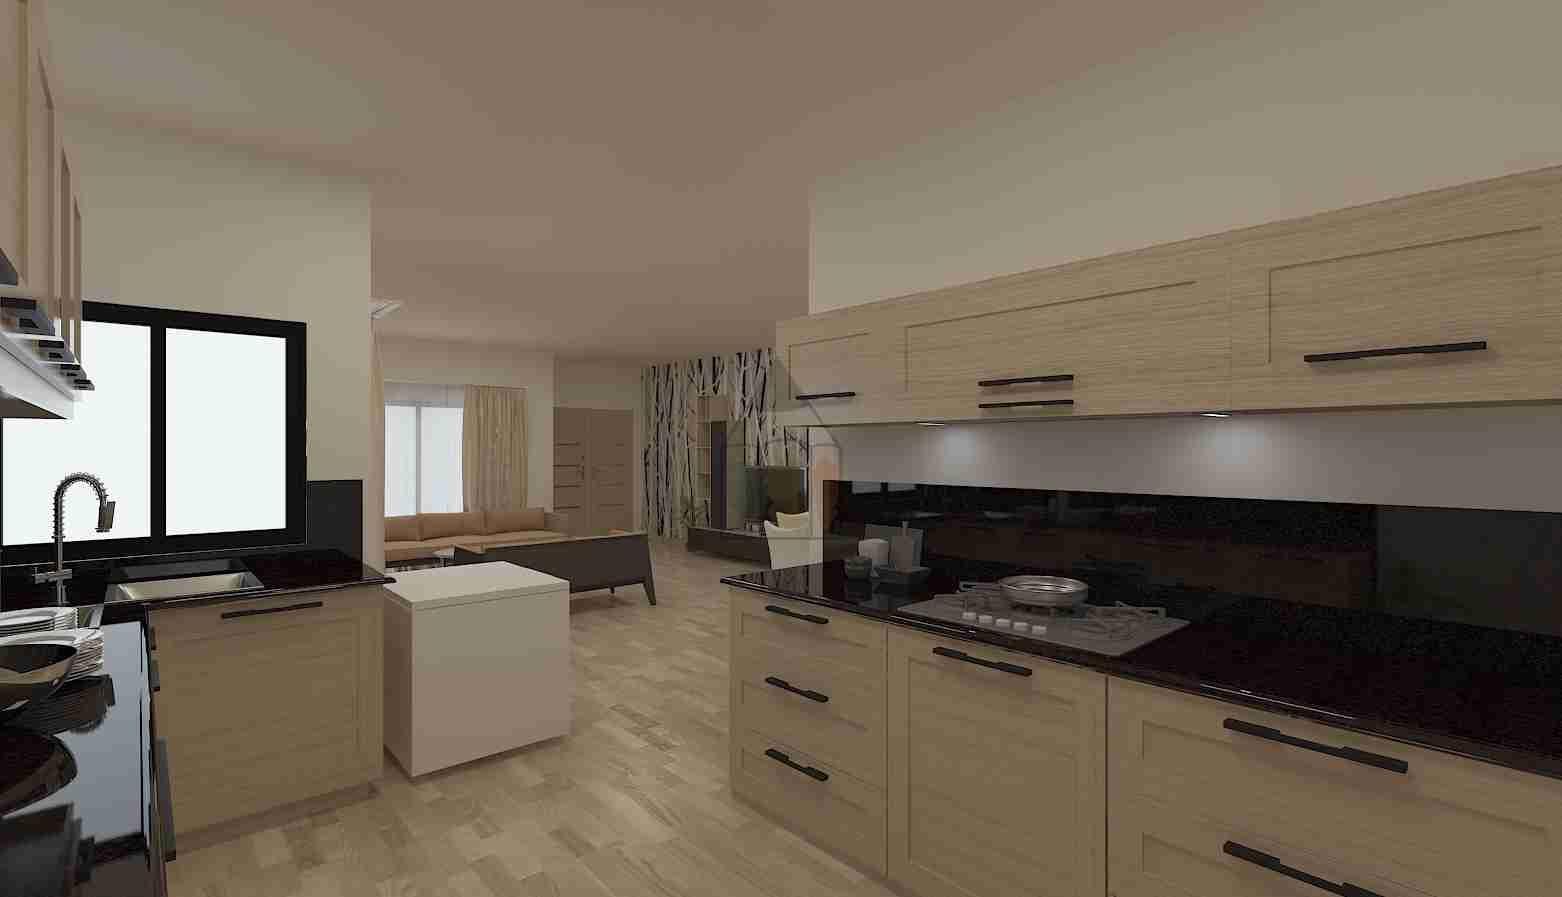 lasani kitchen wood design 1 | Kitchen design modern small ...